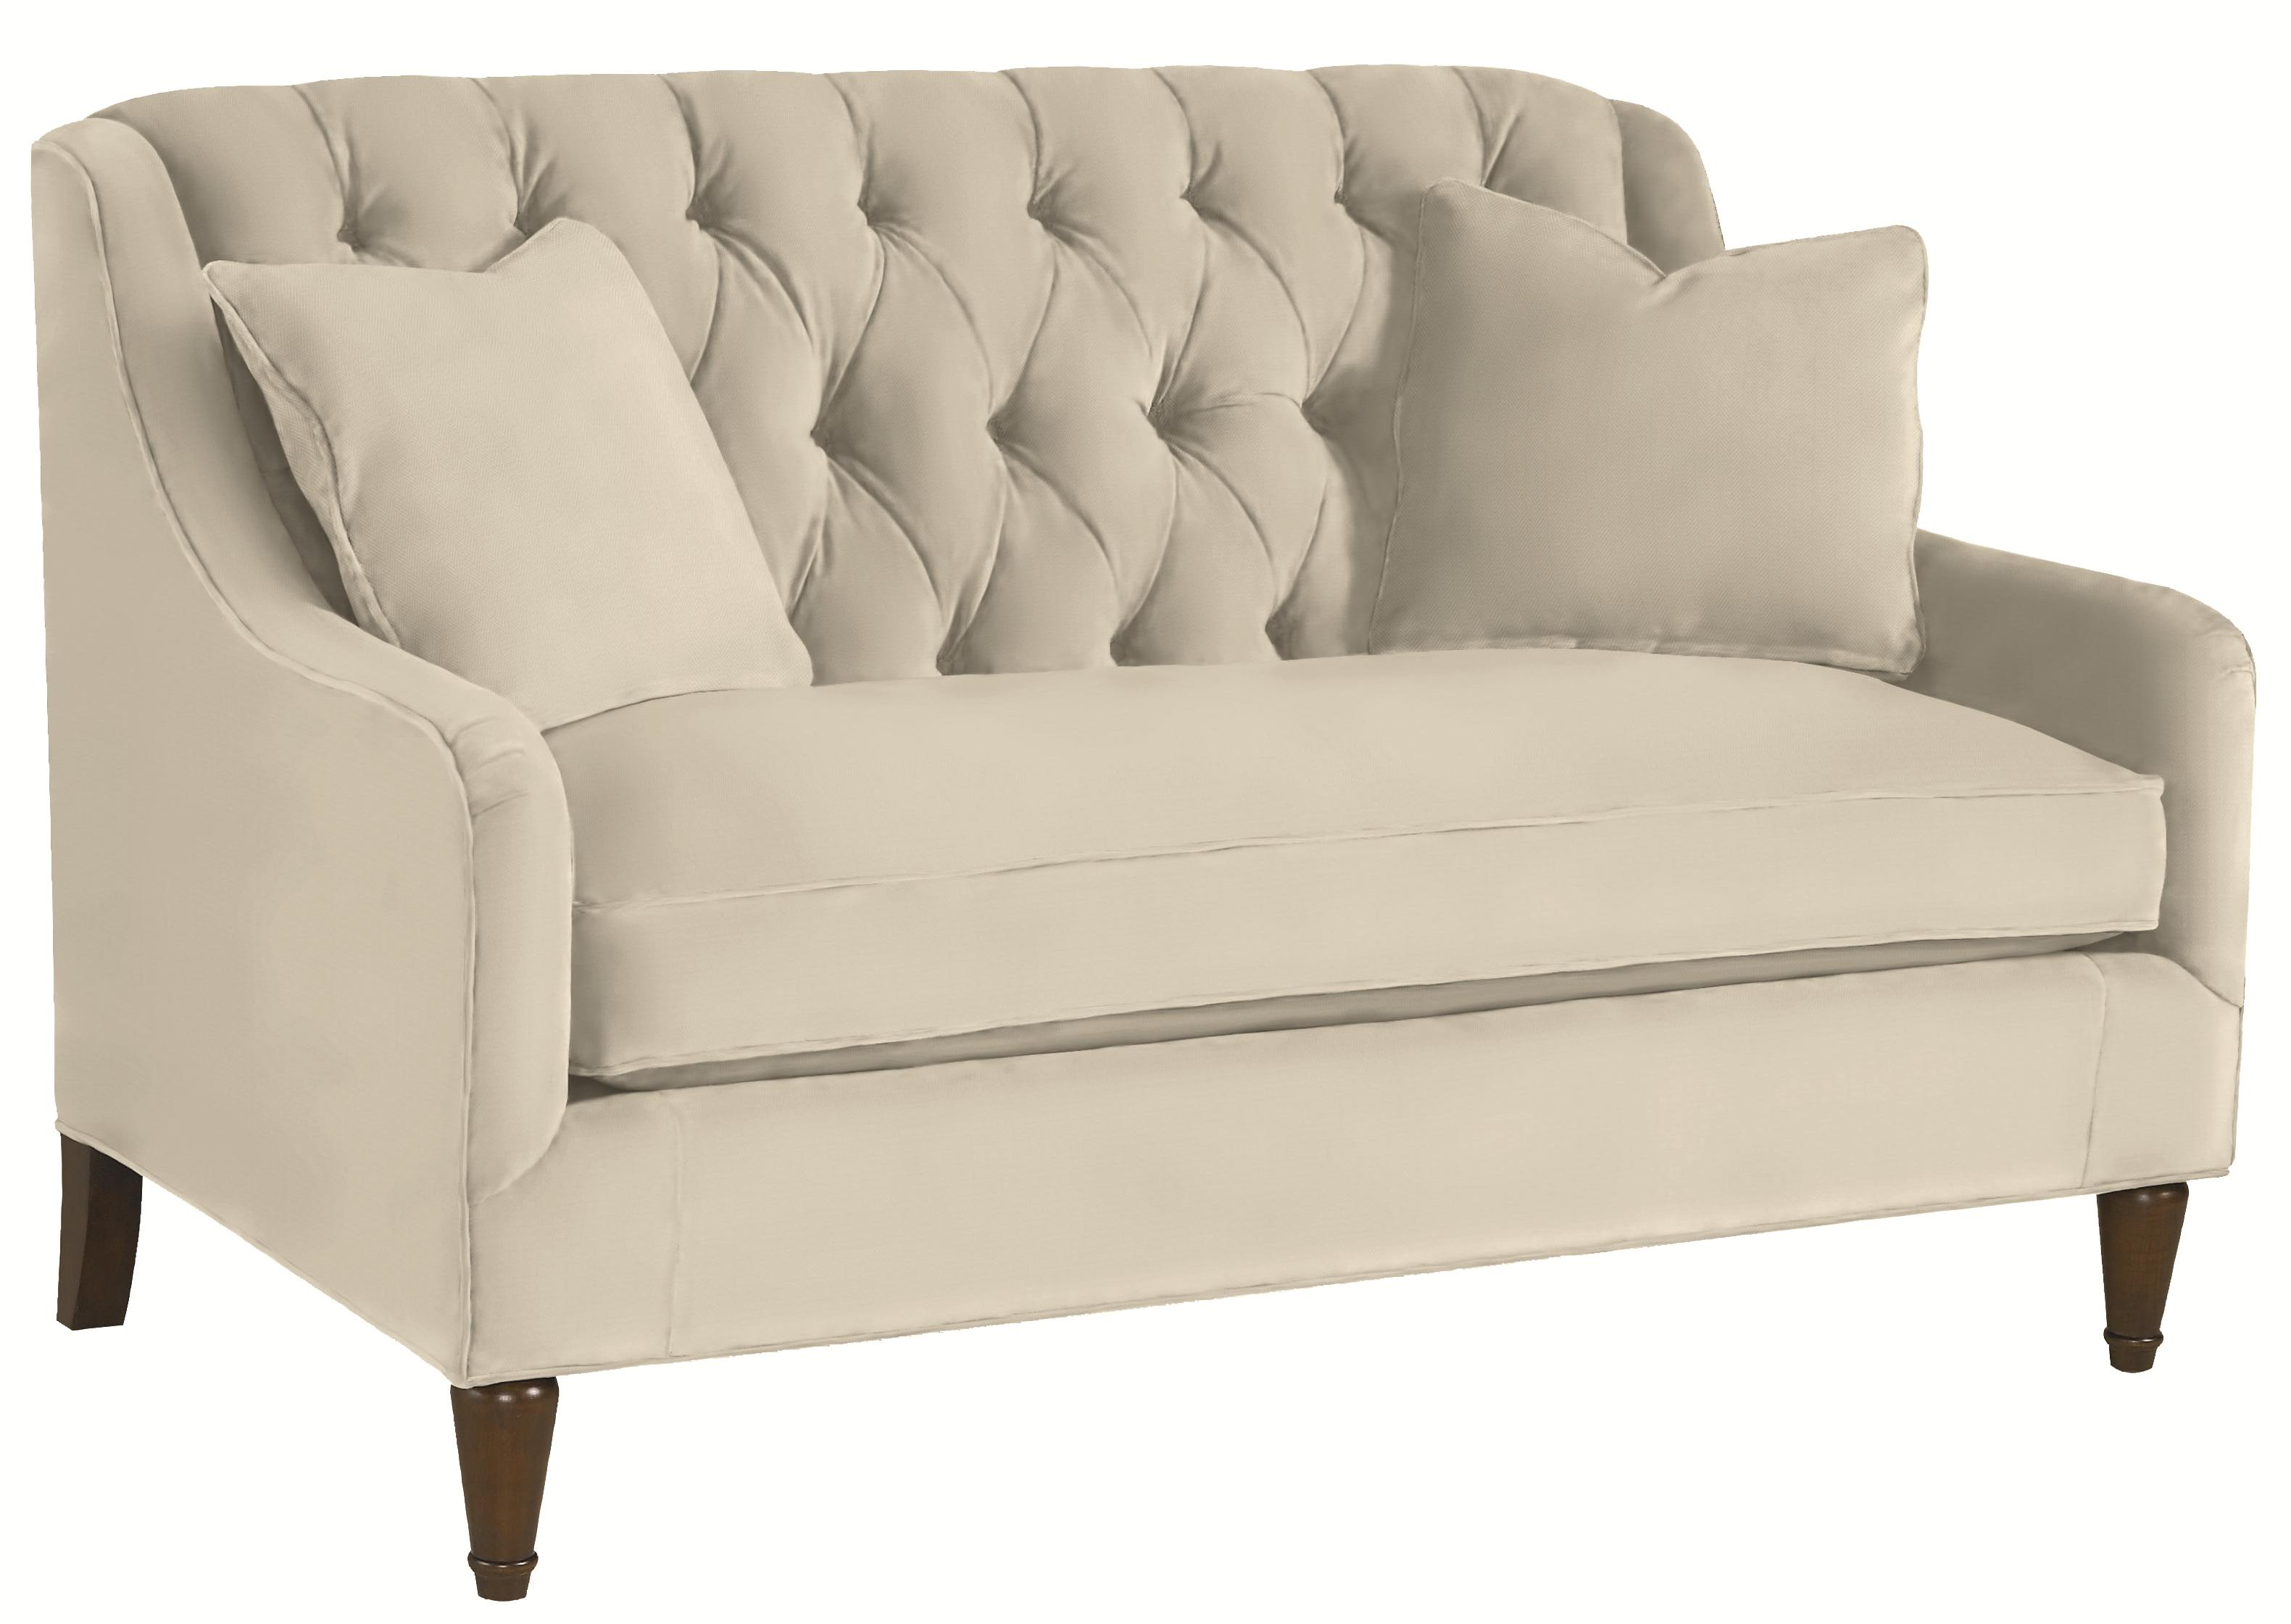 Thomasville barcelona tufted back settee sofa darvin for Pink sofa login